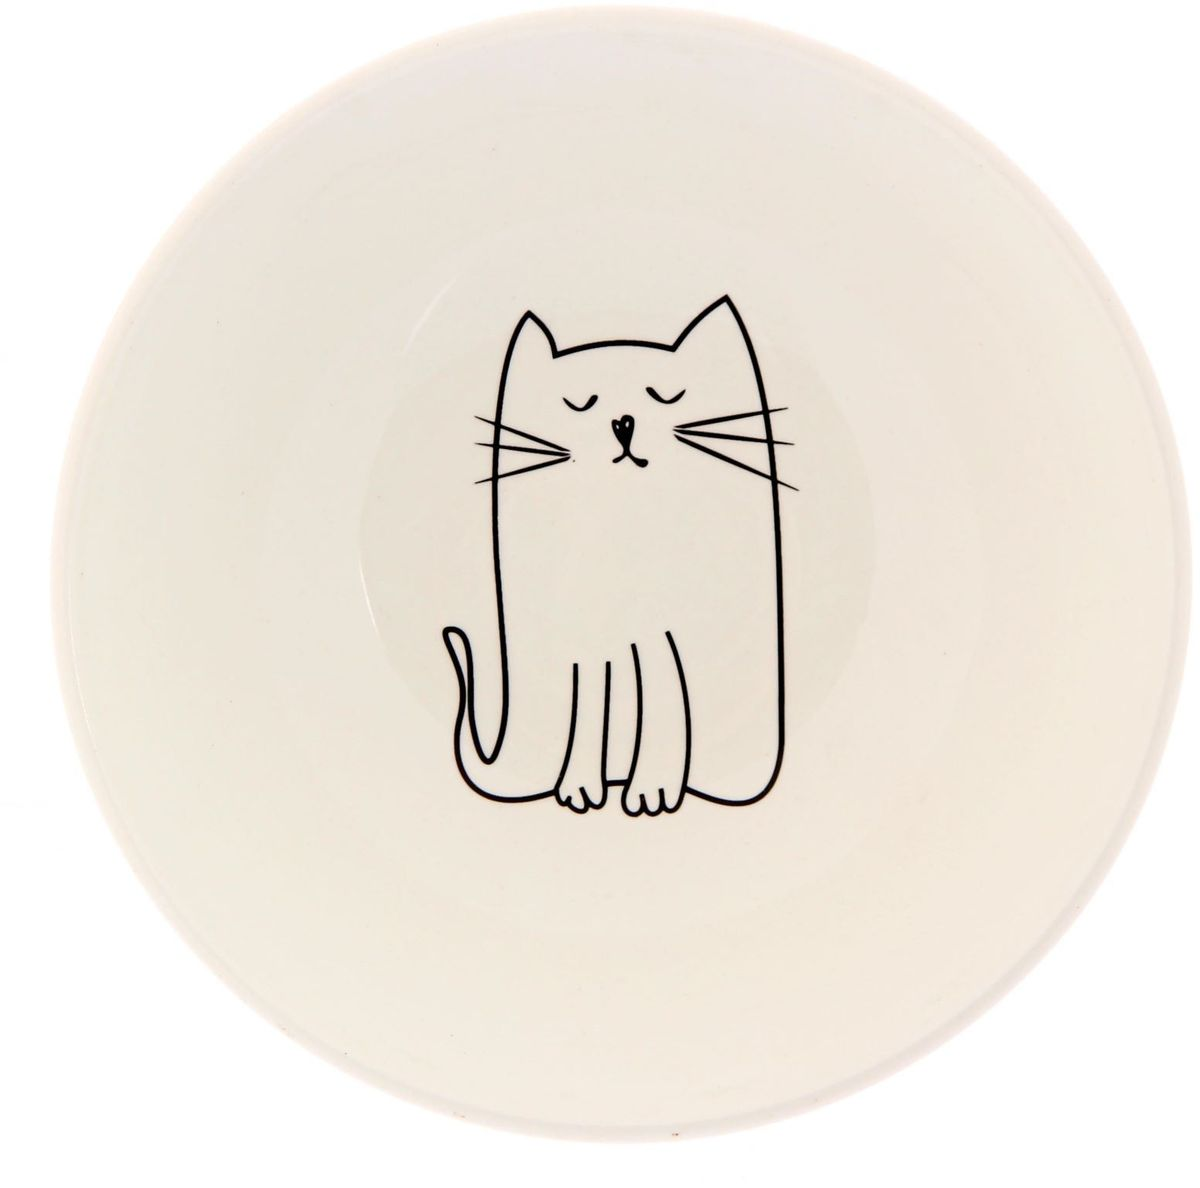 Салатник Сотвори чудо Киска, диаметр 16,5 см тарелка мелкая сотвори чудо бантик sans brides диаметр 20 см